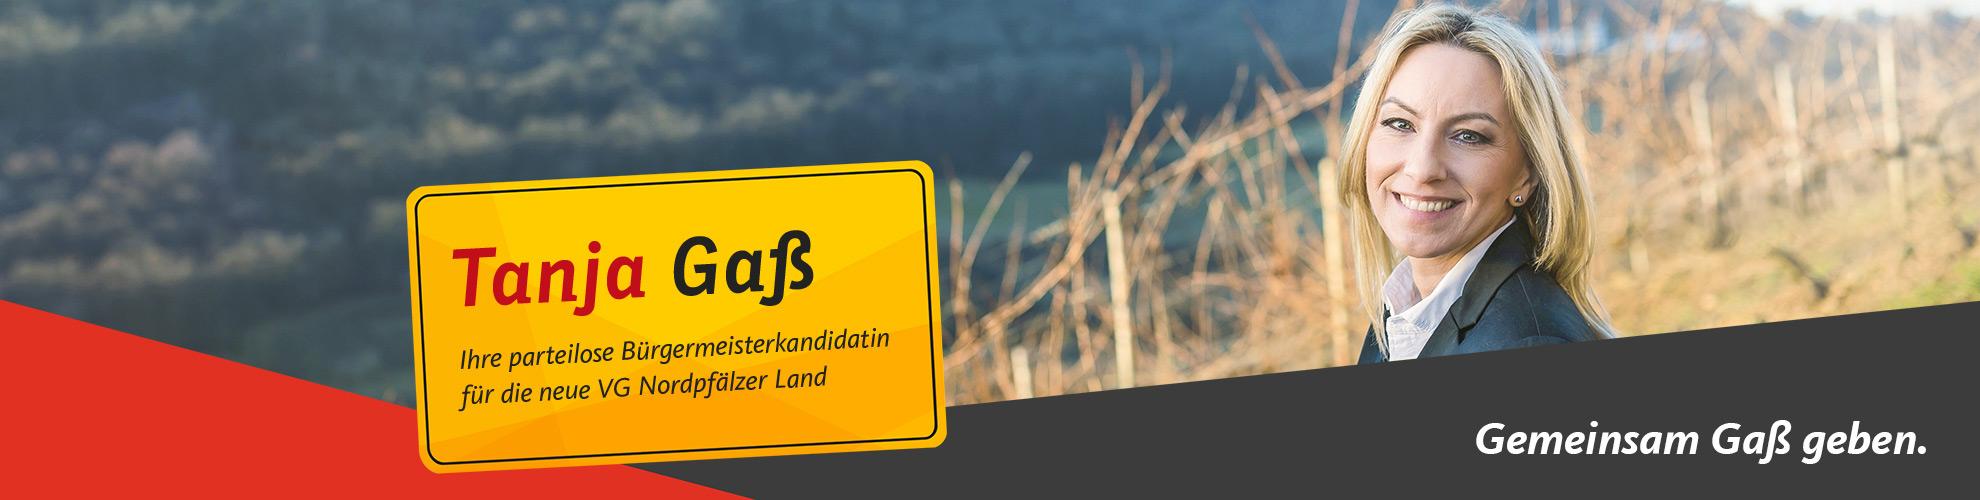 CDU_2019_web_footer_tanjaGass_1920x800px_desktop_V2